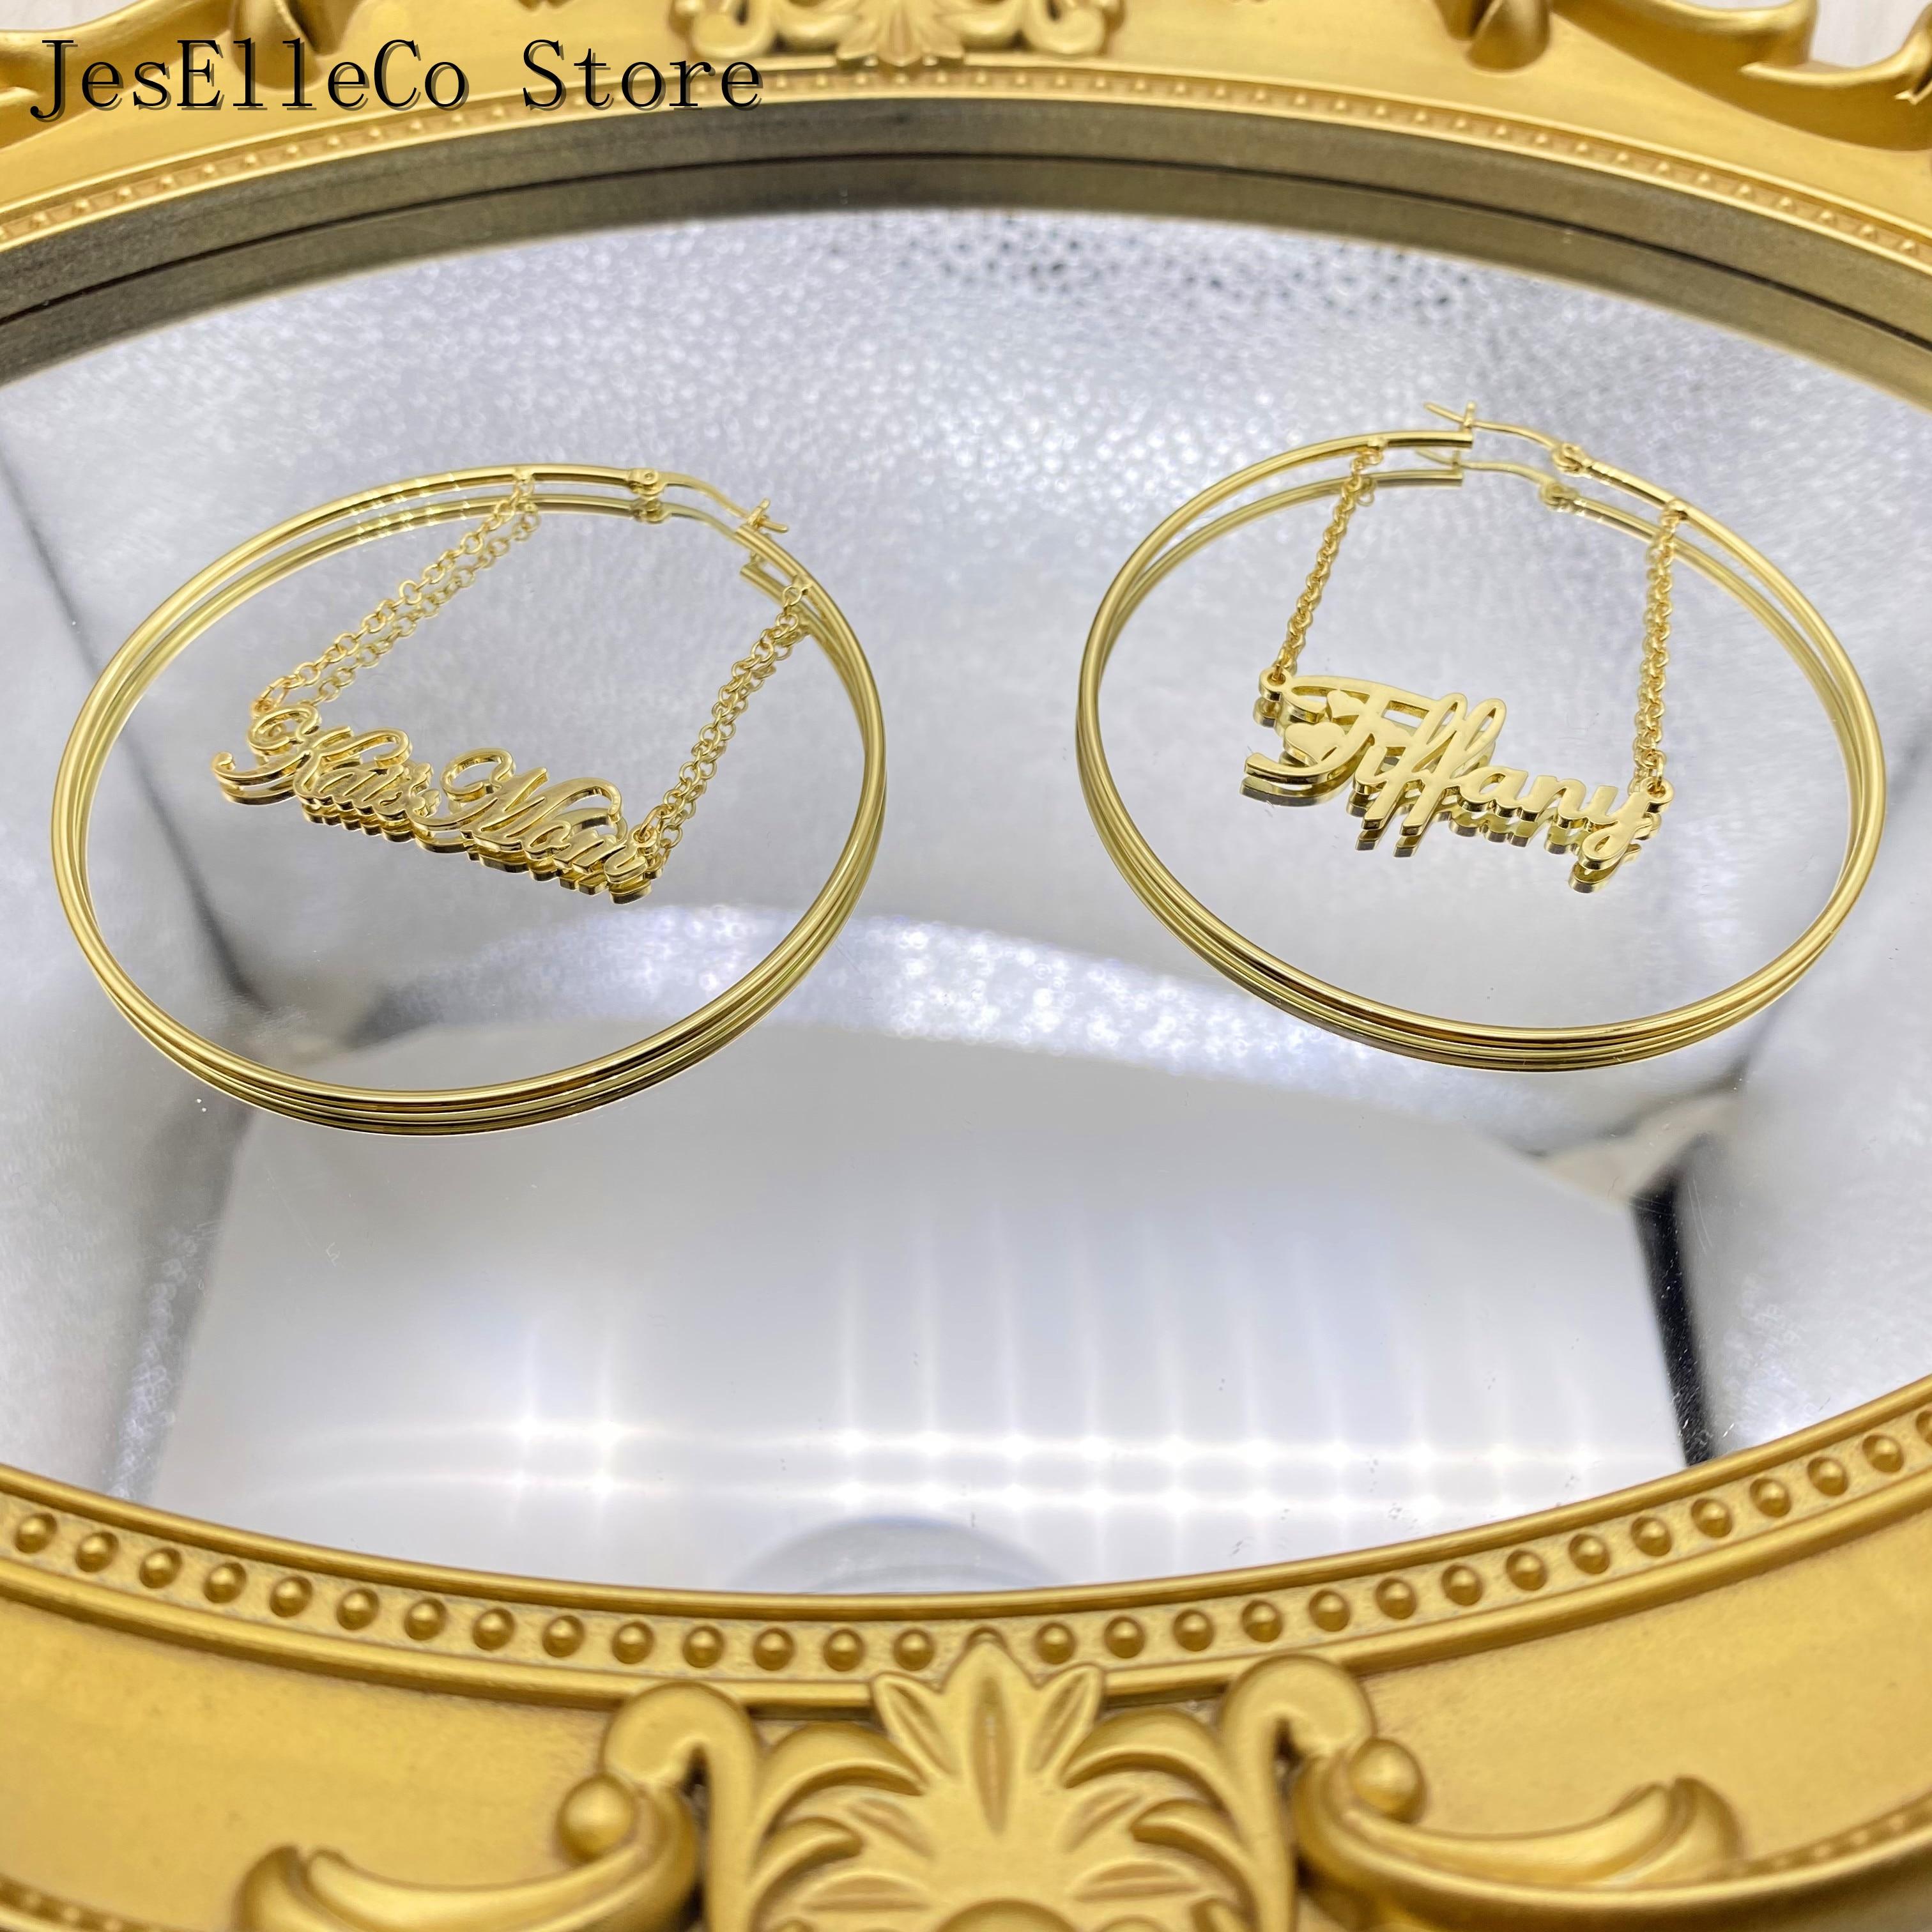 Custom Earrings PersonalizeName Stainless Steel Letter Earrings For Women 3 Color Custom Name Circle Earrings Weddings Jewelry